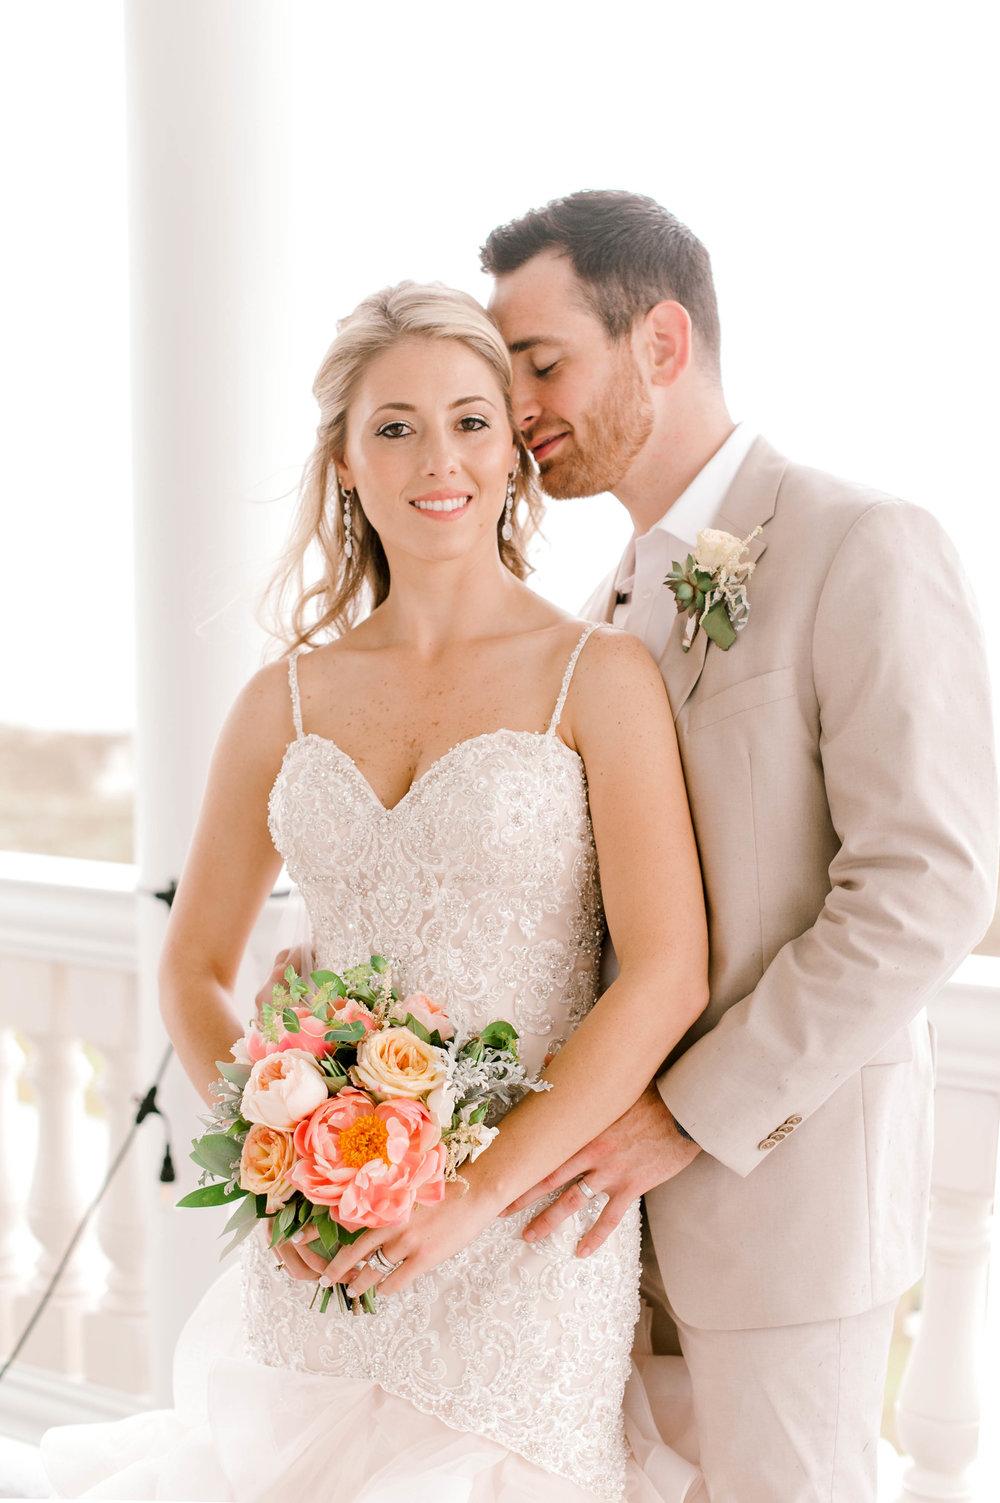 Sunset Beach, SC Wedding - Sunset Beach, South Carolina Beach Wedding. Hosanna Wilmot Photographer is a Myrtle Beach Wedding Photographer specializing in Wedding Photography